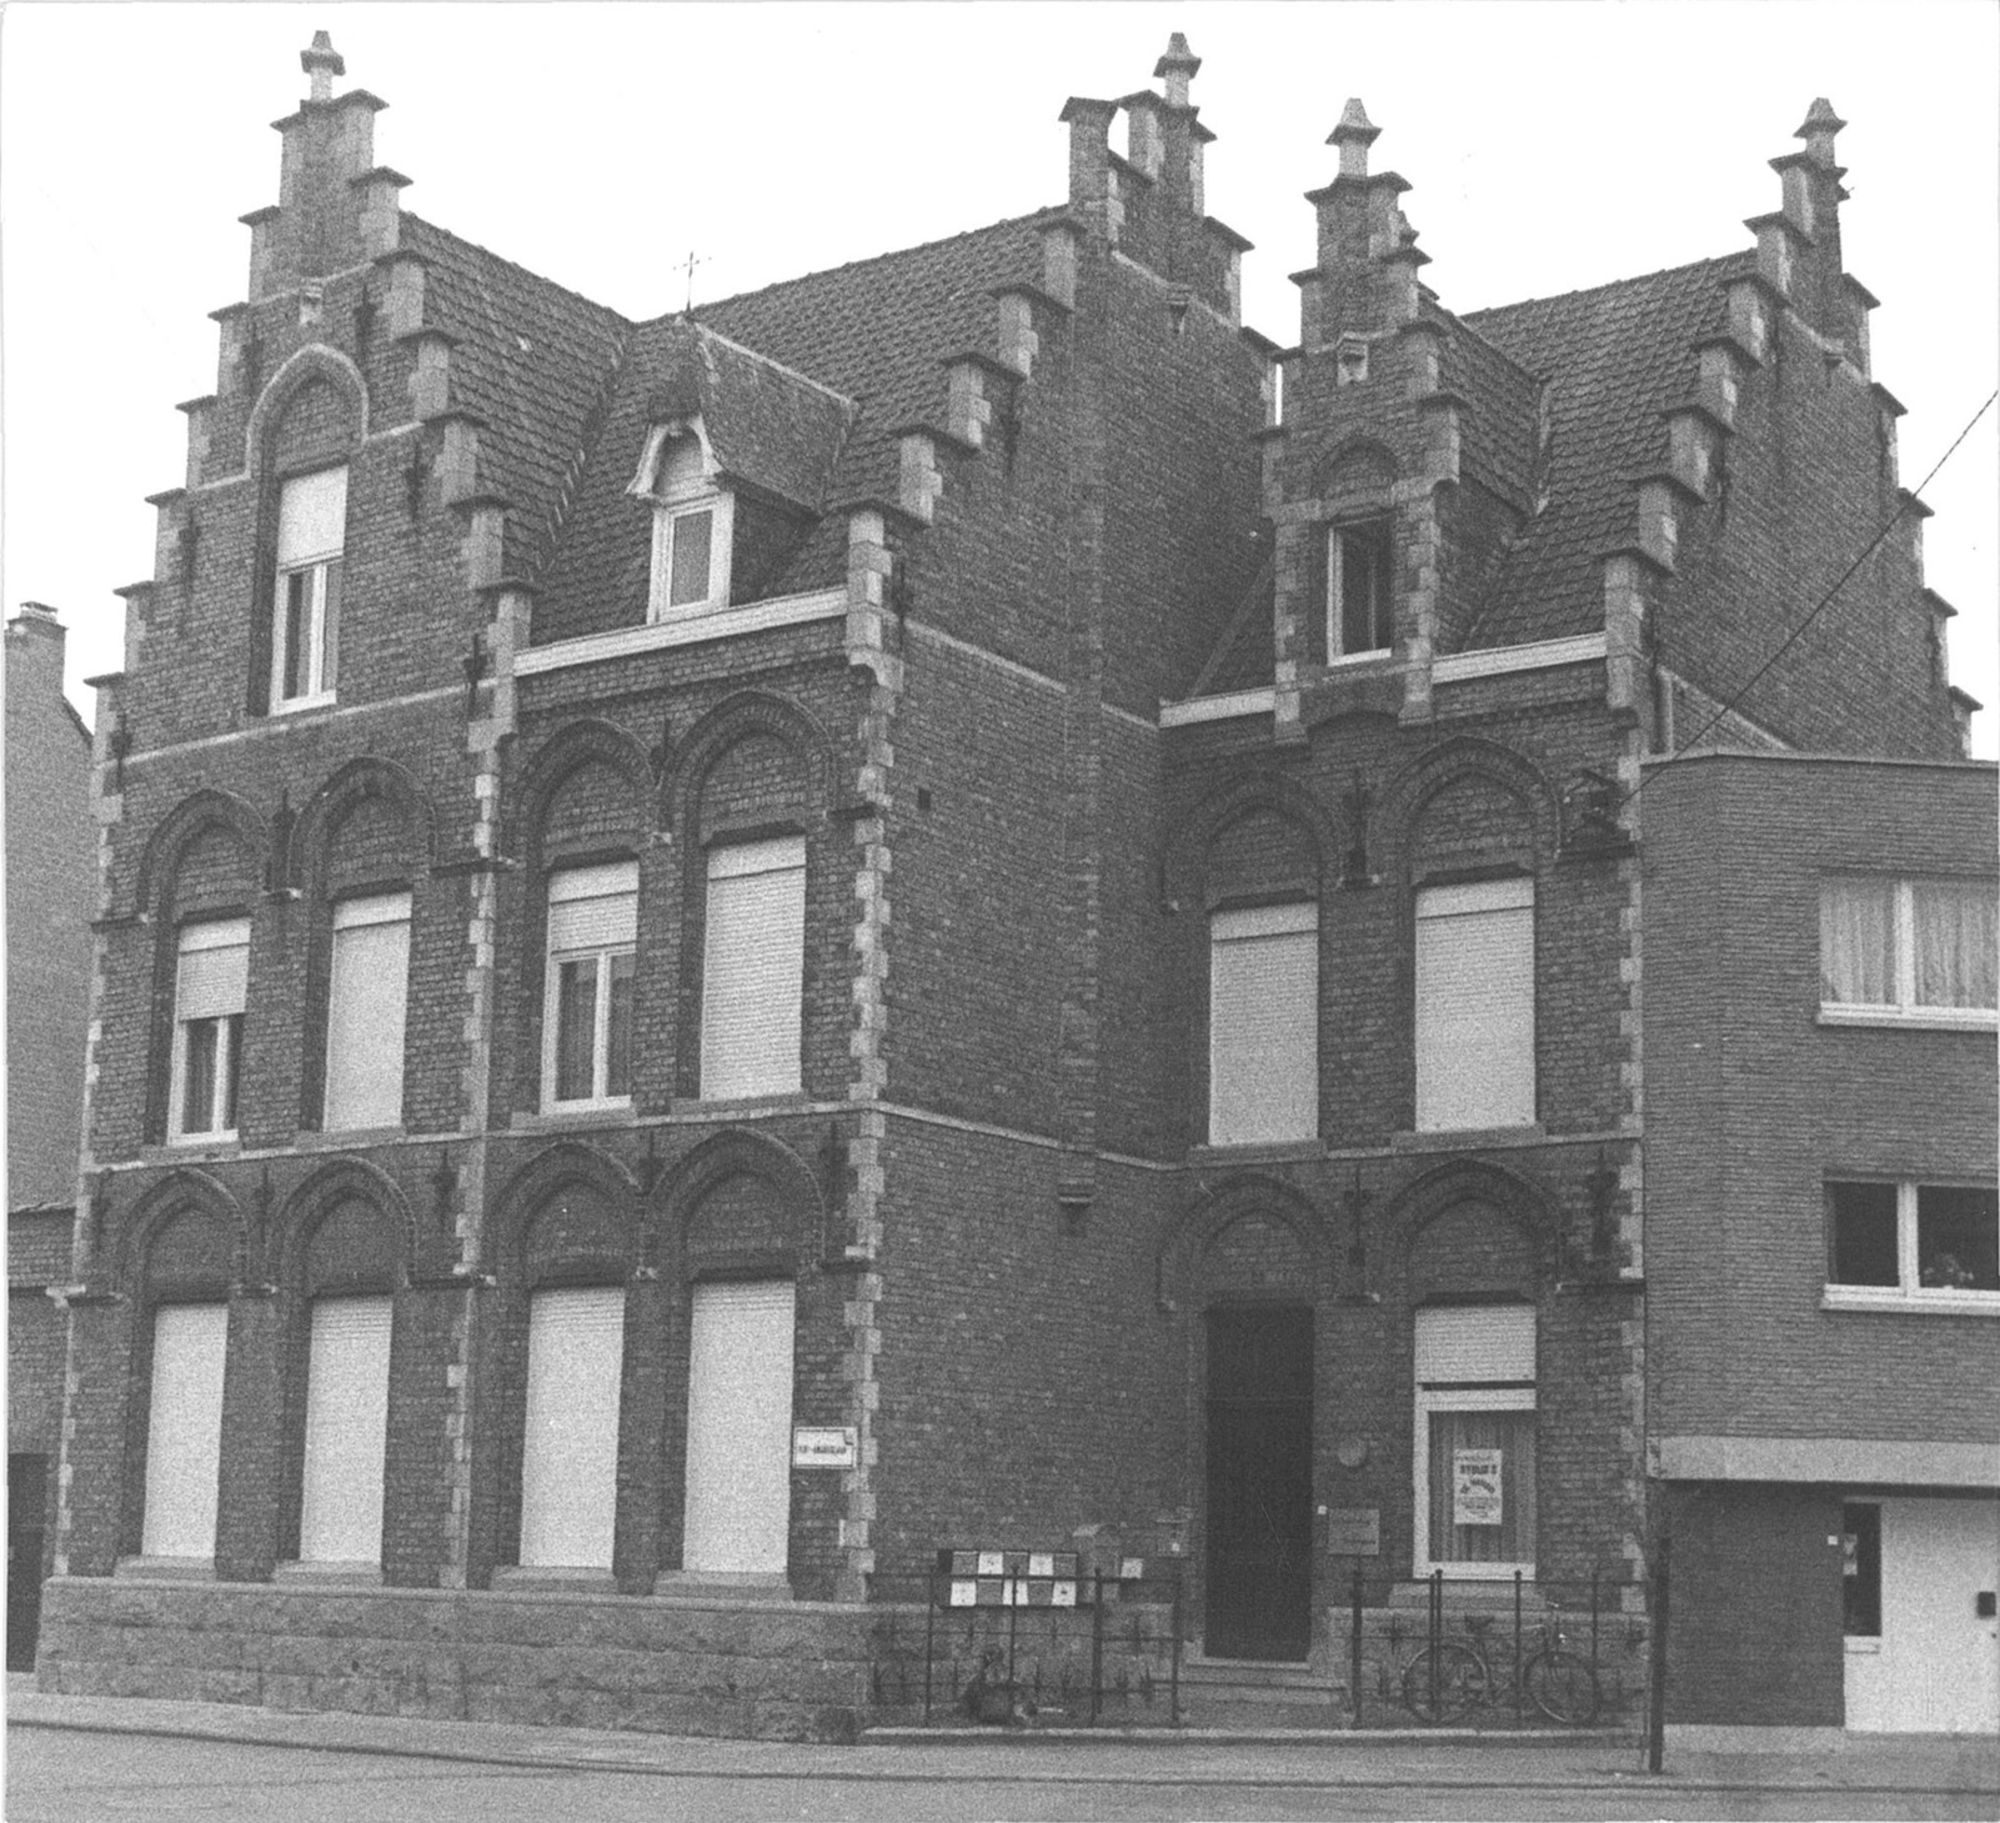 Sint-Amandslaan 13 in 1981